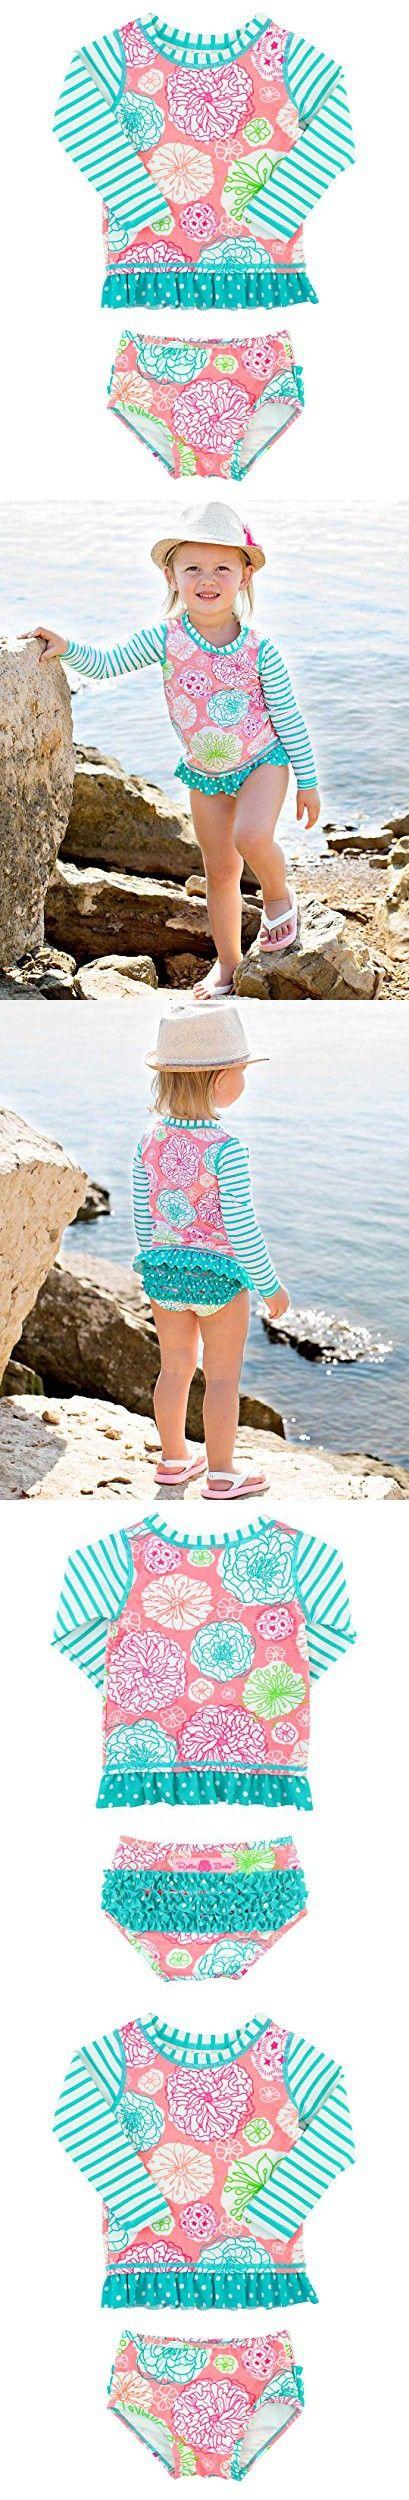 RuffleButts Infant / Toddler Girls Floral Striped Mix-Print Long Sleeve Rash Guard Set w/ Ruffles - Multi - 18-24m